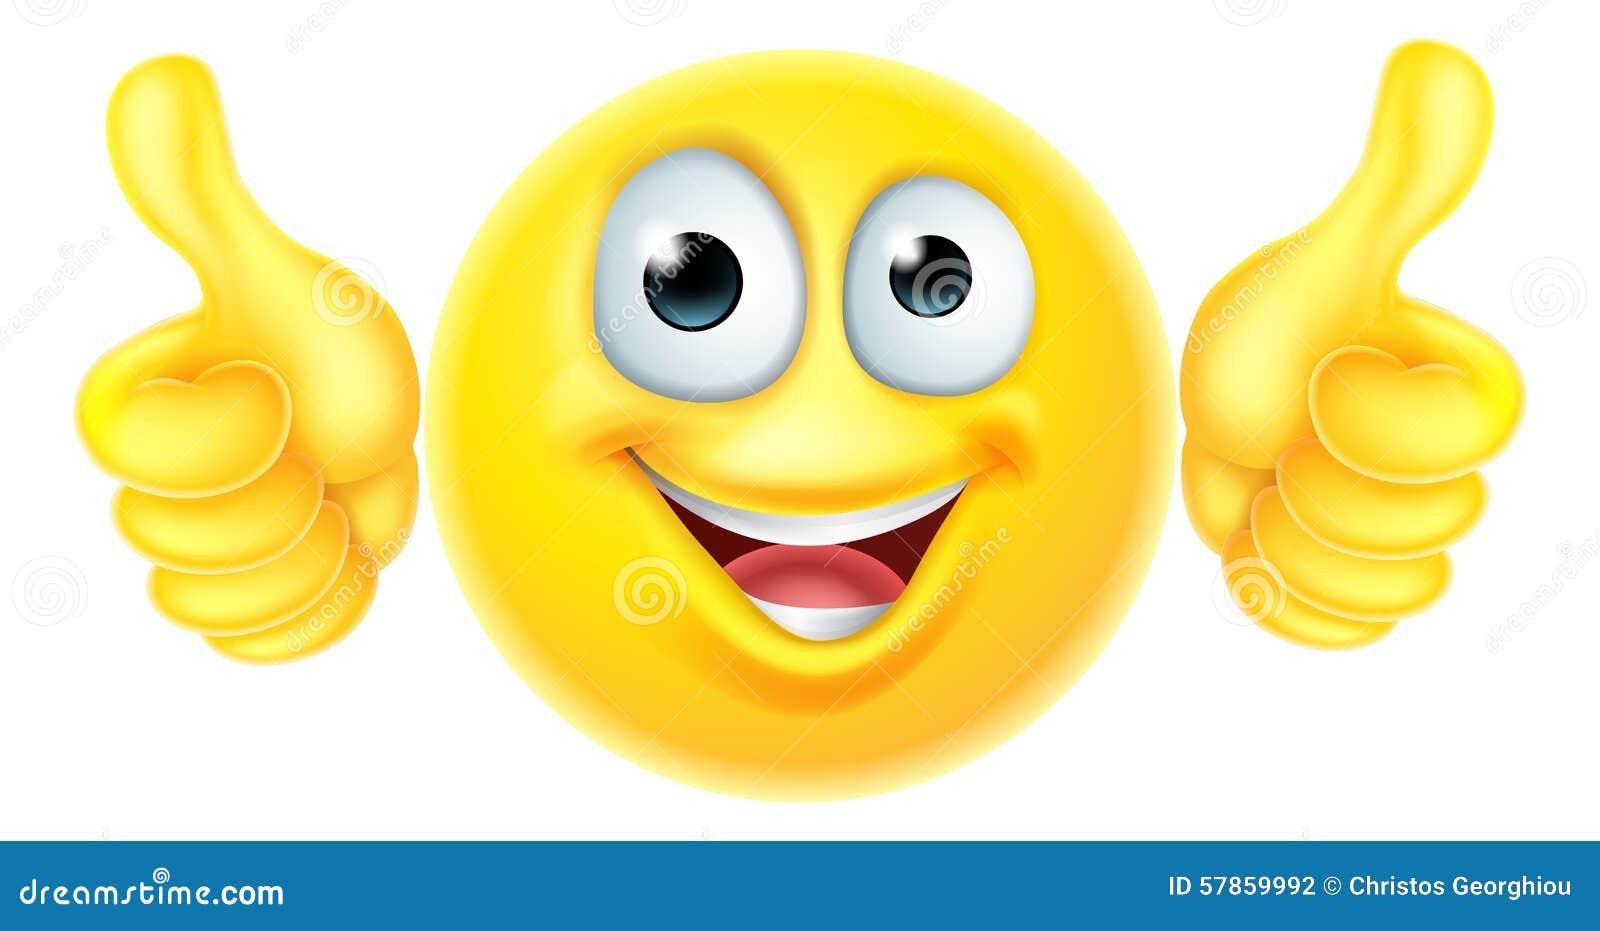 Thumbs up emoticon emoji